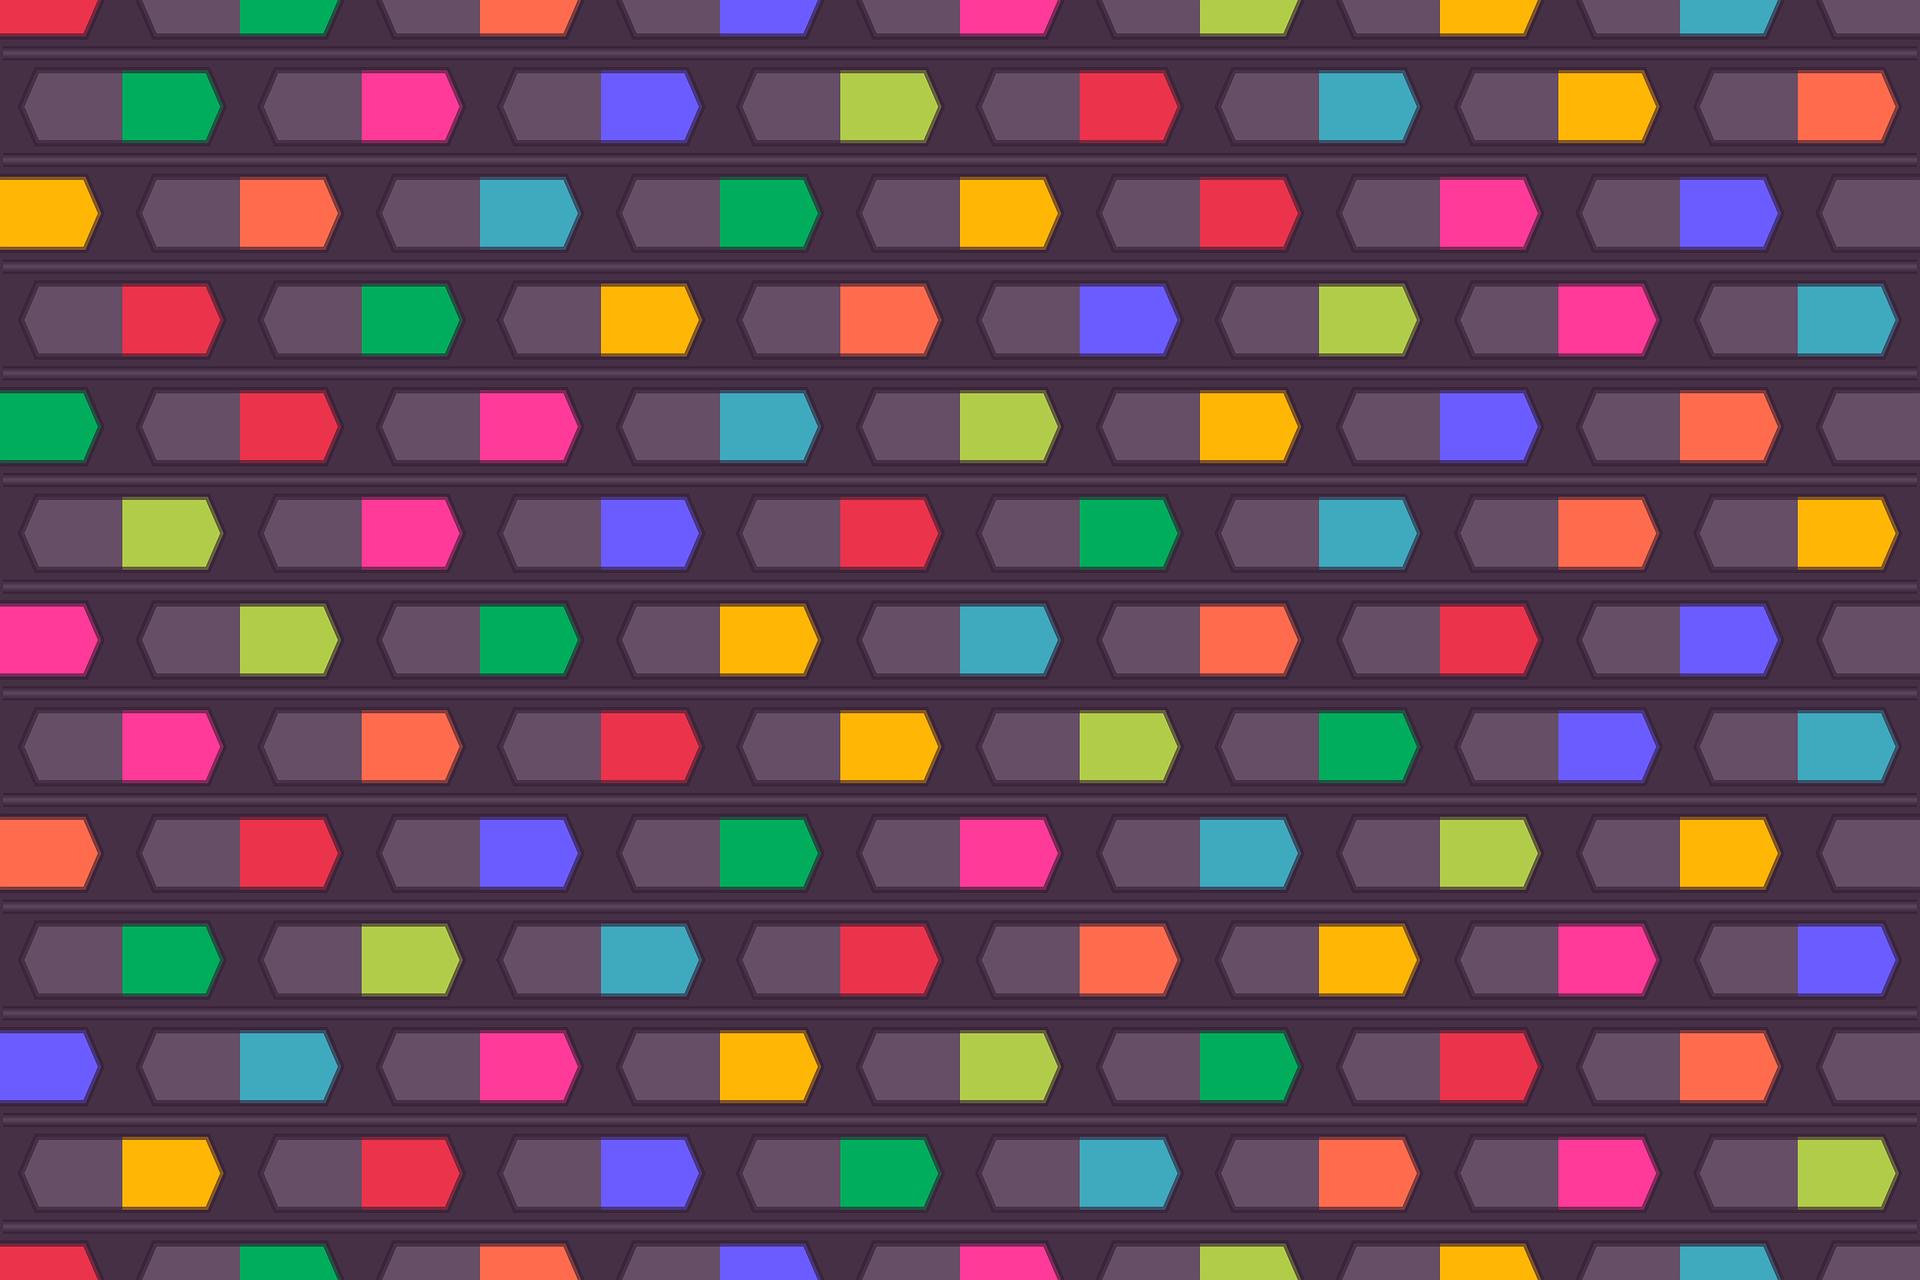 Samsung Galaxy S8 Wallpaper Hd Fondo De Pantalla De Geometr 237 A Colores Geom 233 Trico Azul